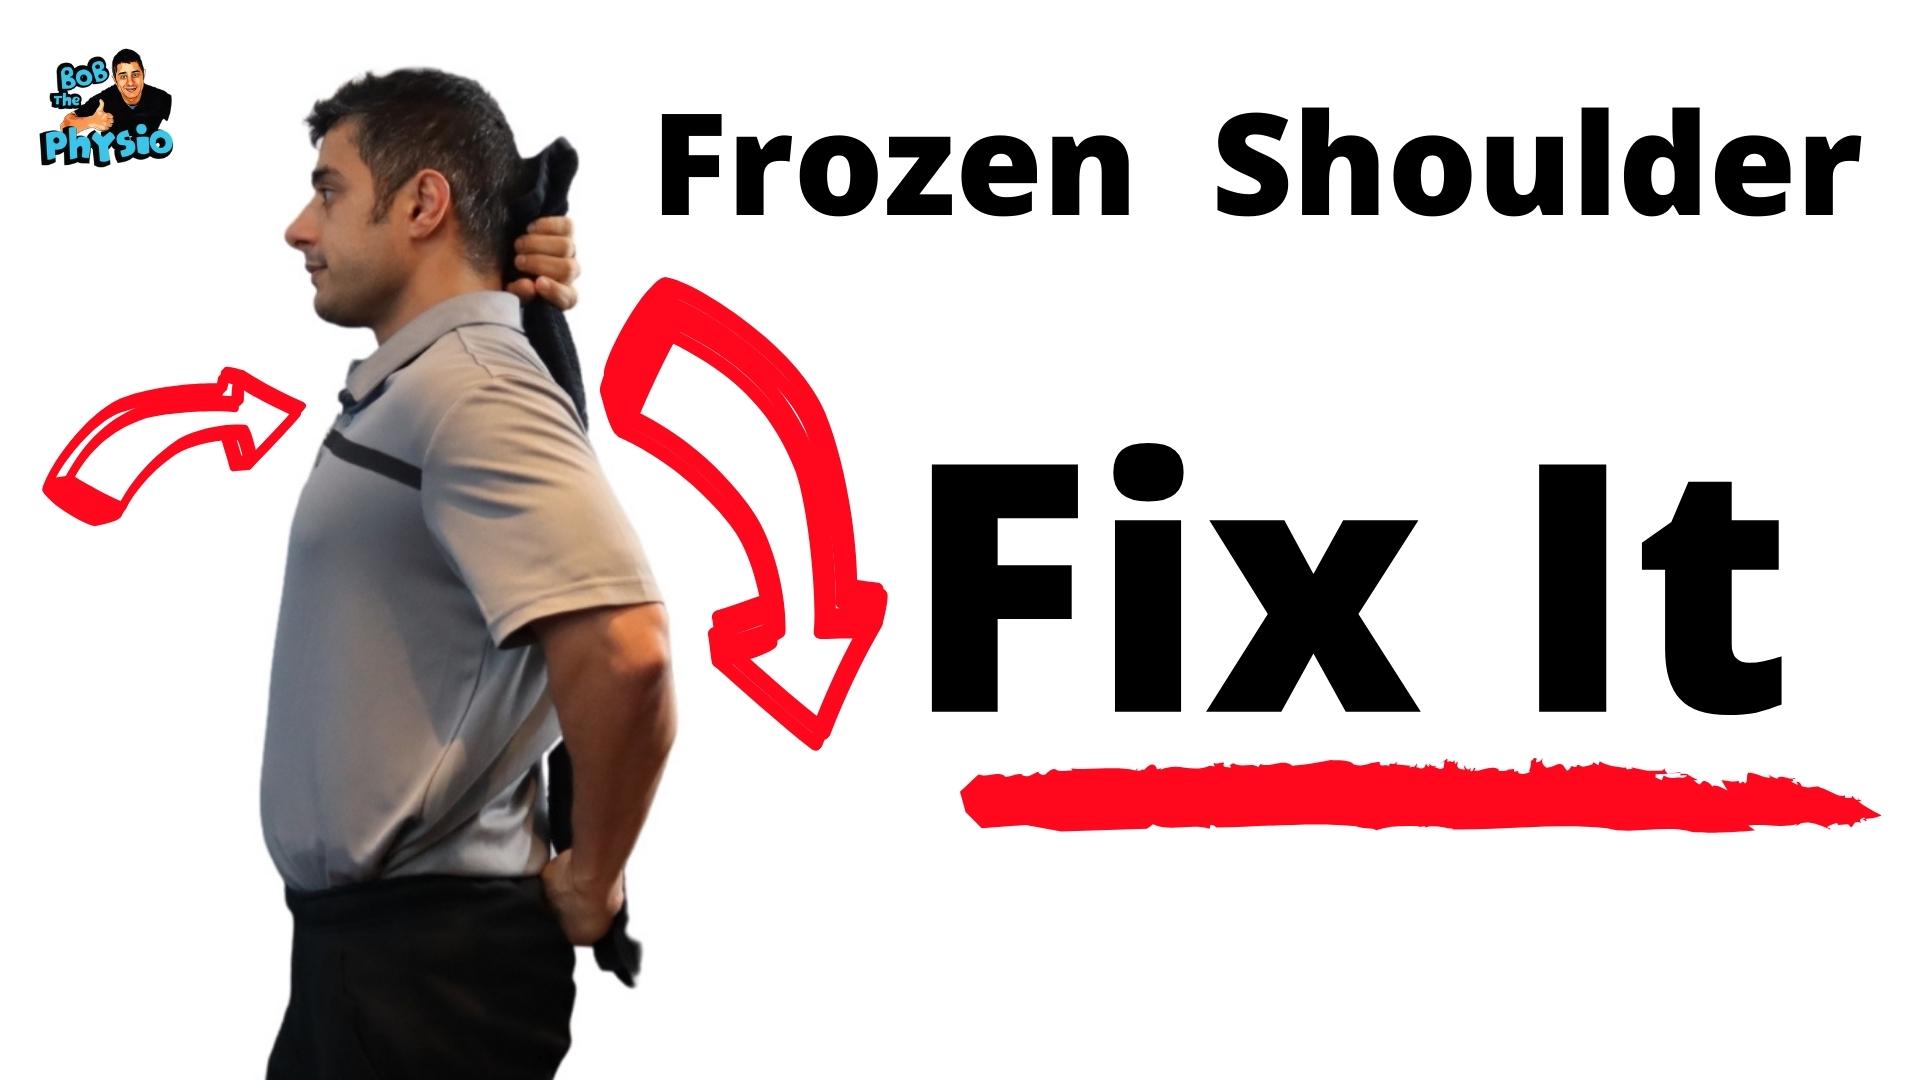 Frozen Shoulder Treatment and Managment